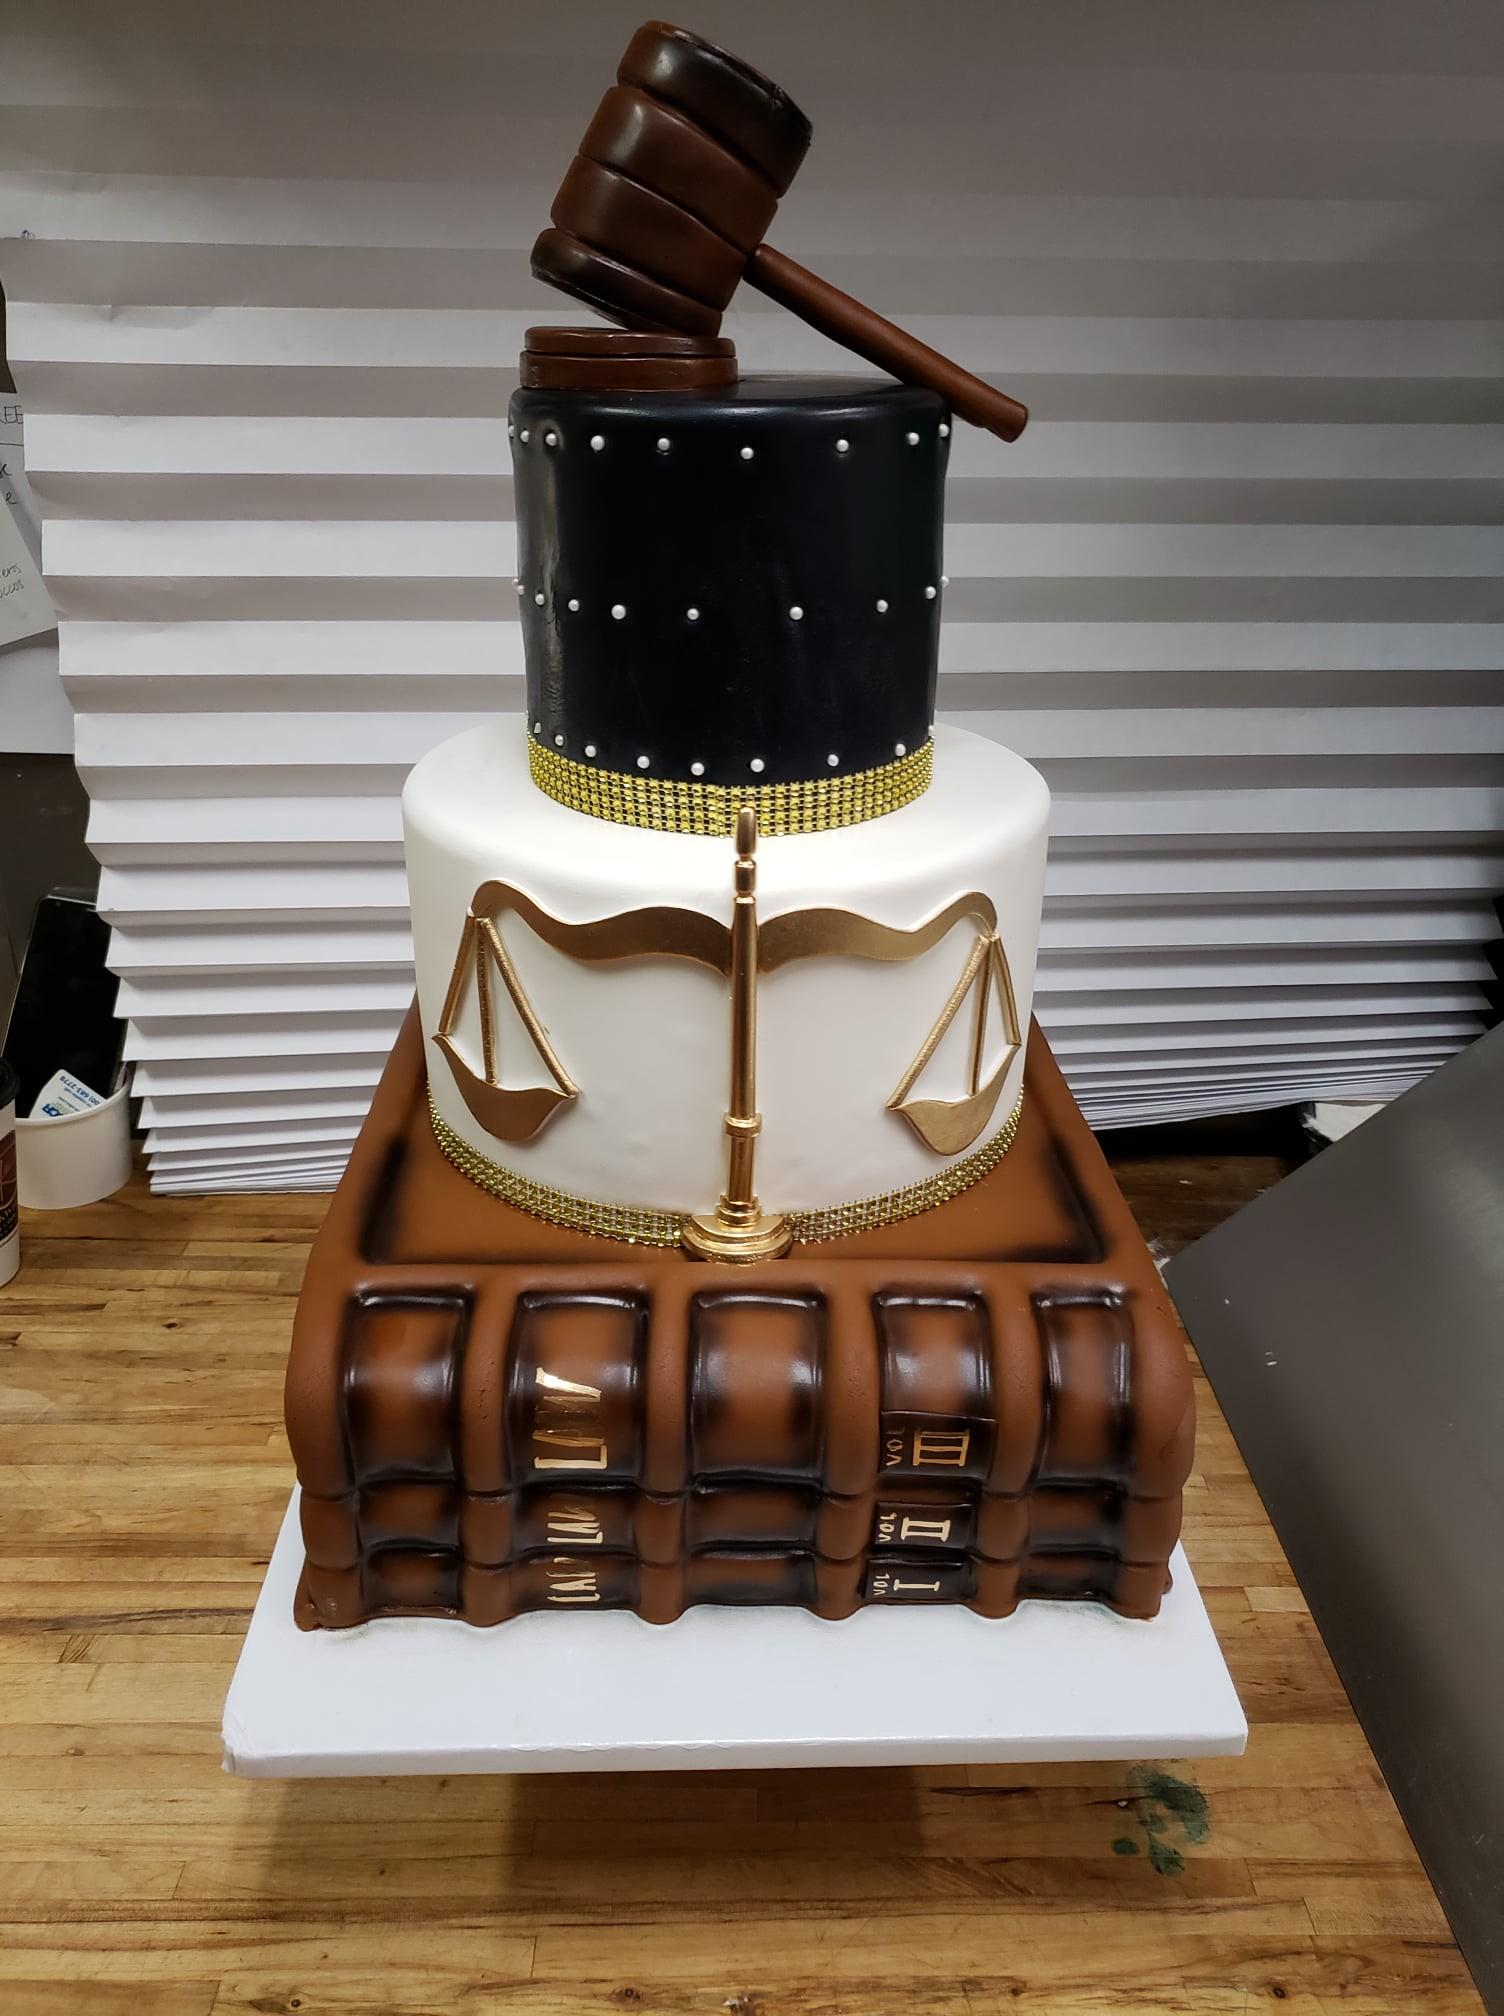 Cake by Juli's Piece of Cake